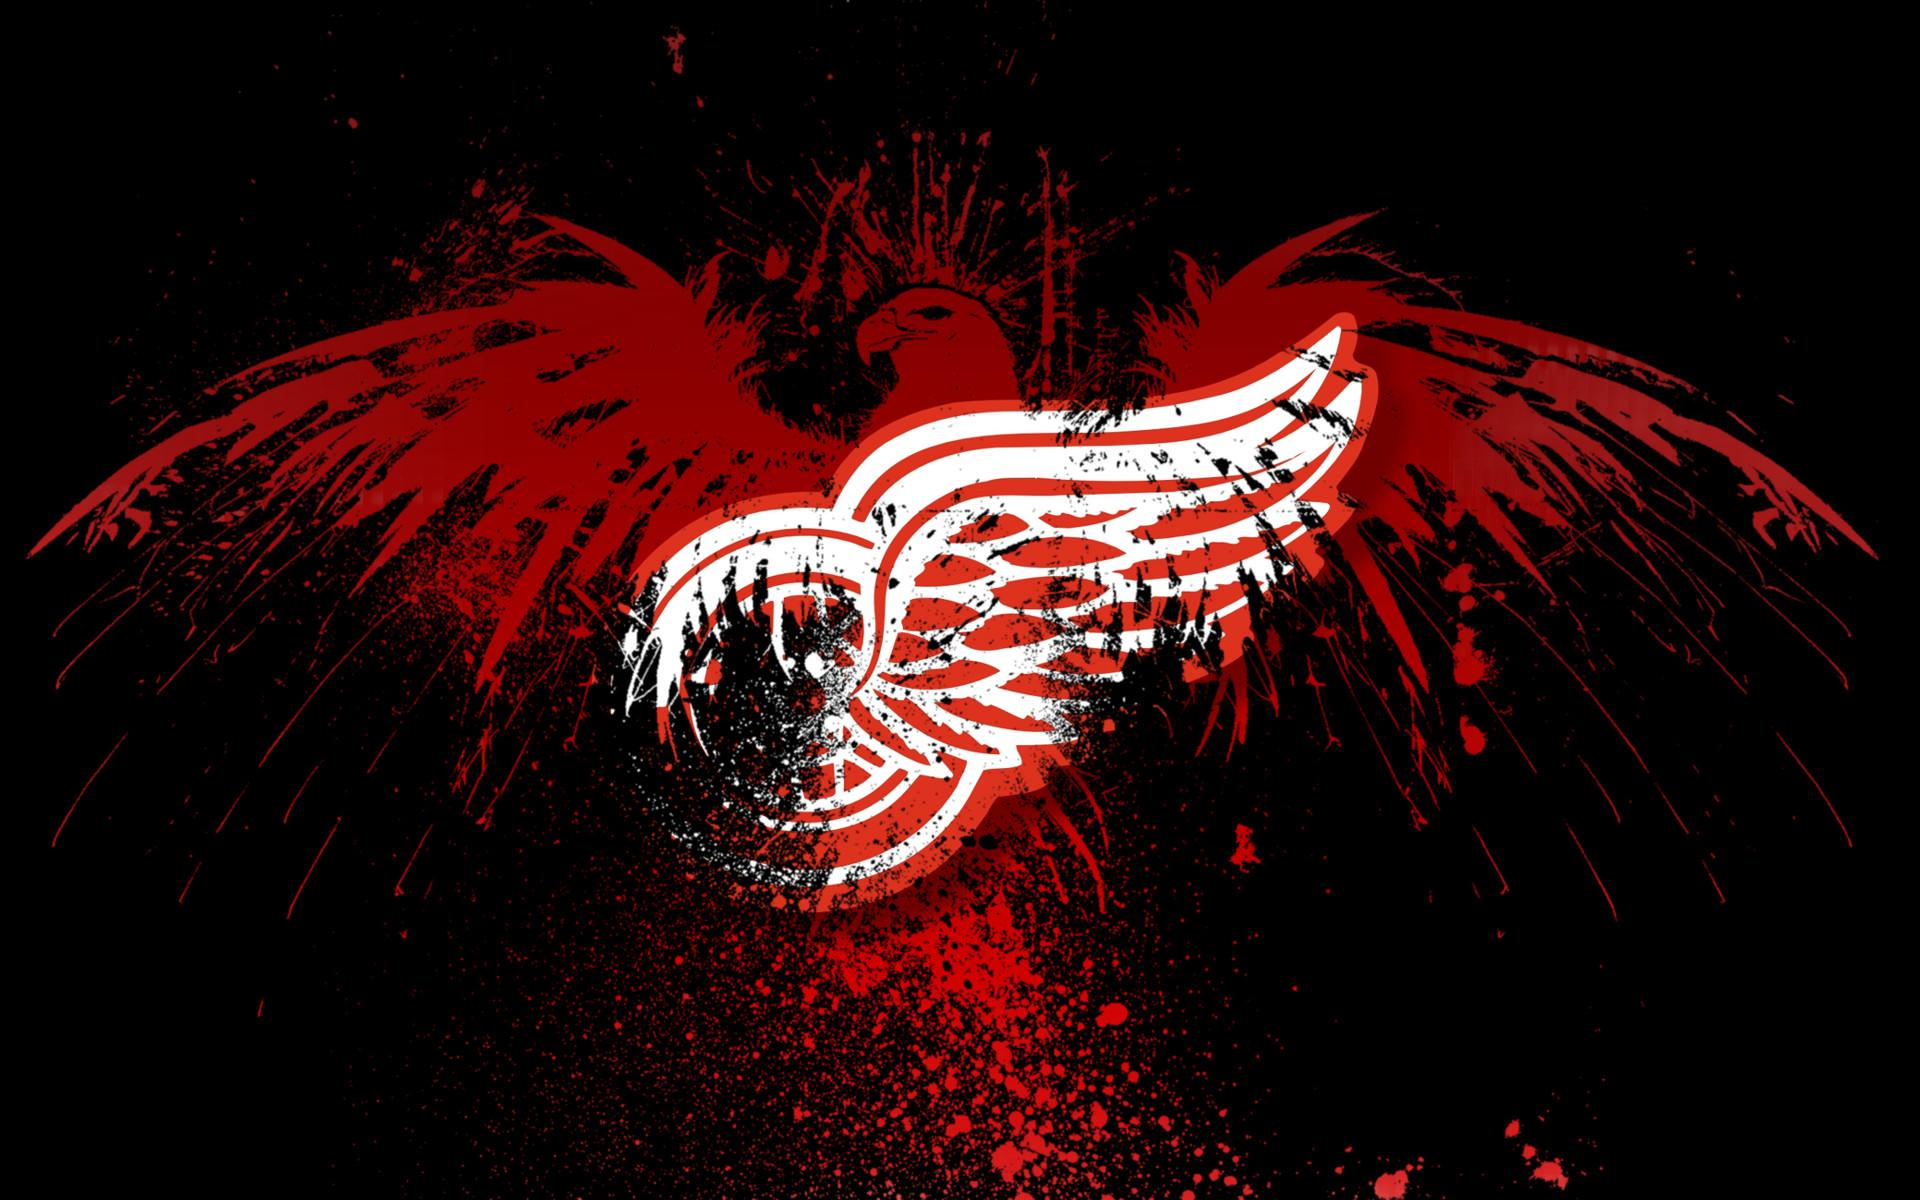 1920x1200 Detroit Red Wings Wallpaper 4